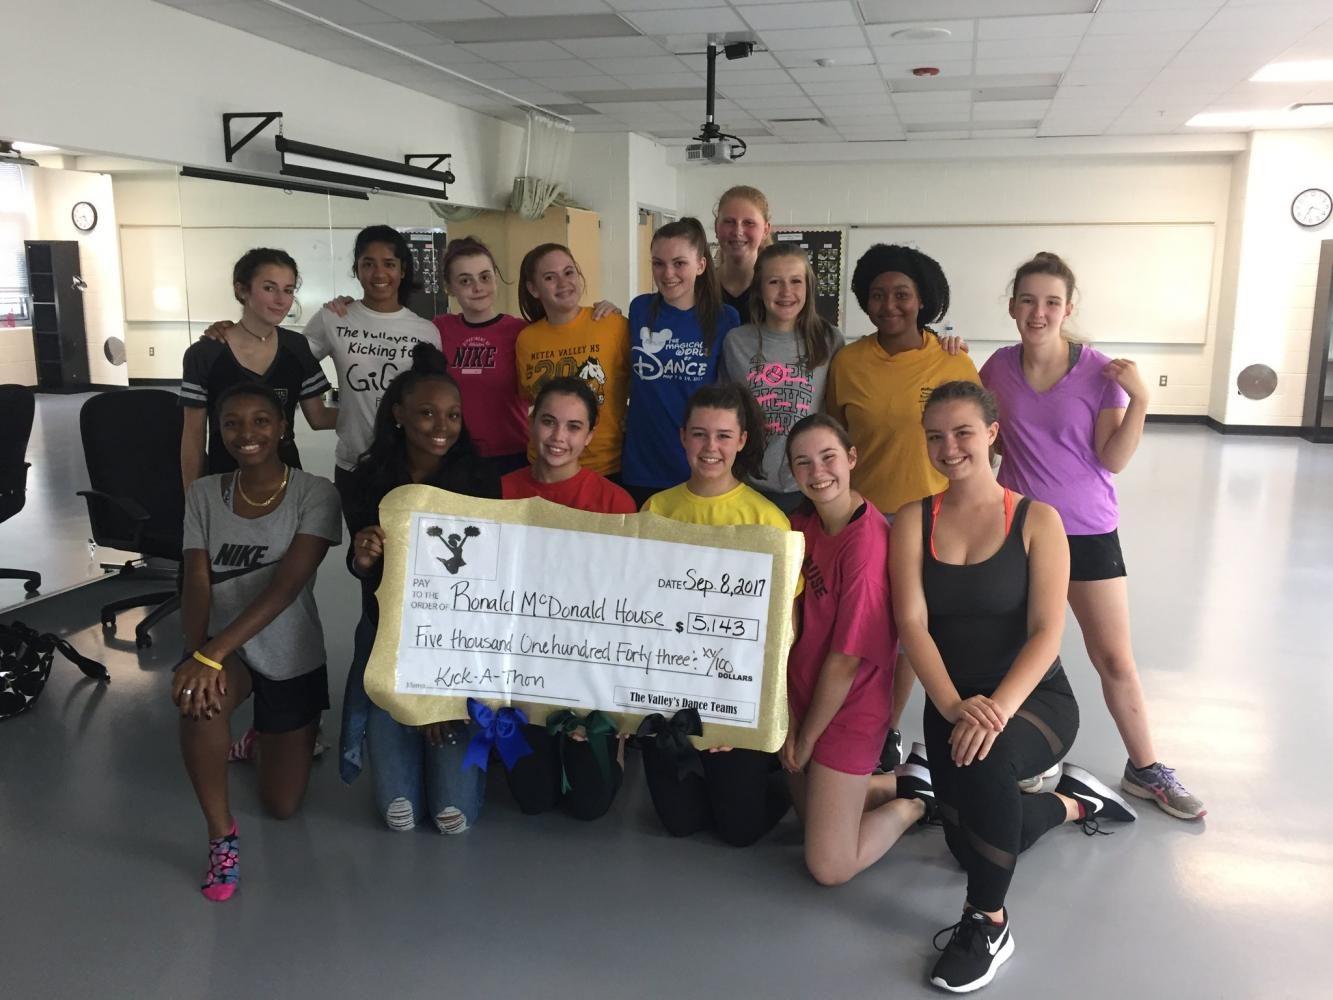 Dance+Team+participates+in+second+annual+kickathon